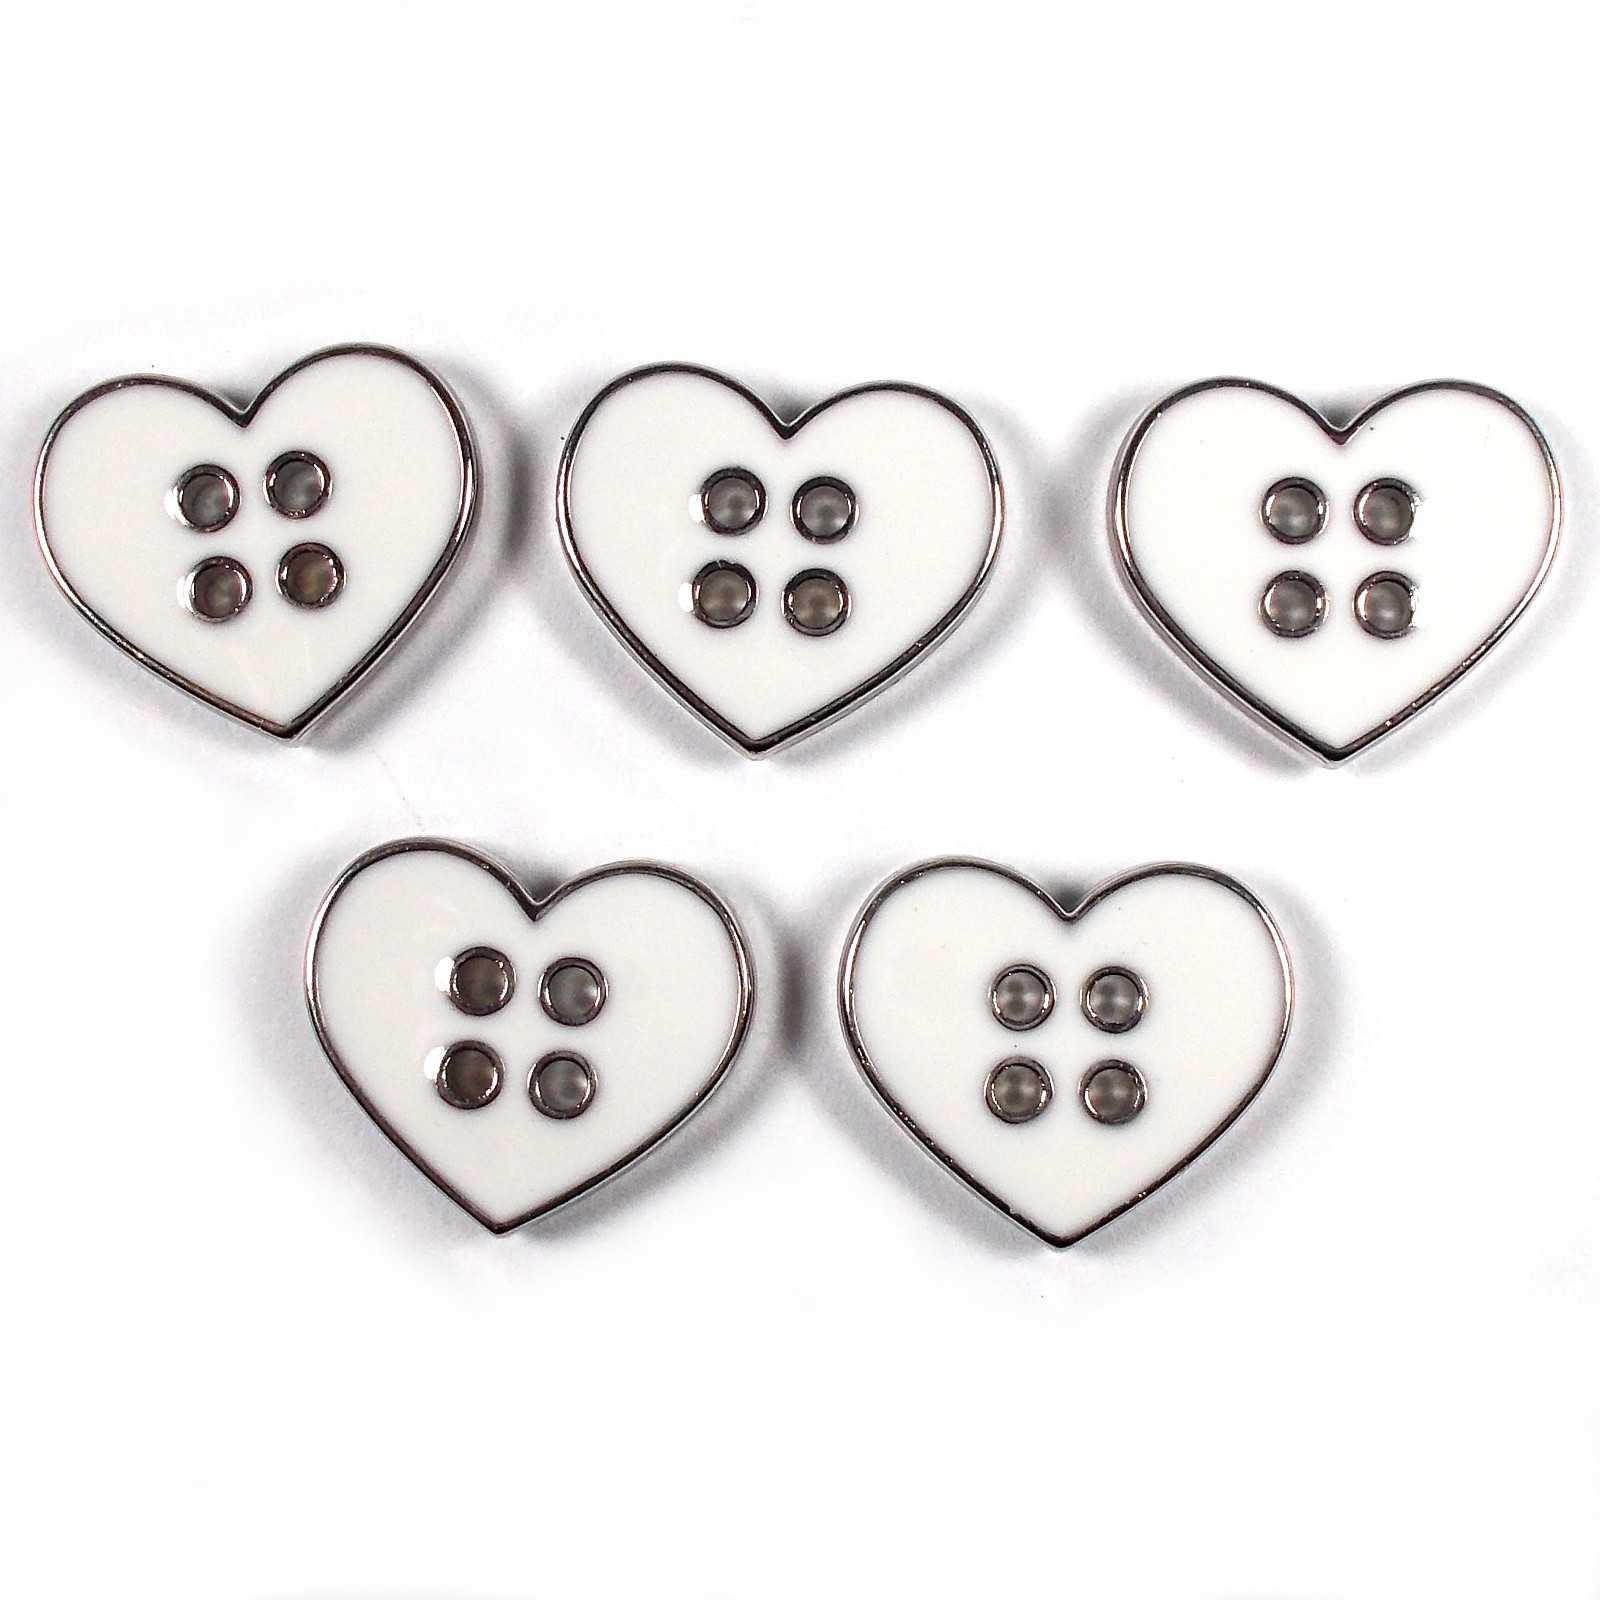 Enamel Metal 4 Hole Heart Silver Colour Buttons 16mm White